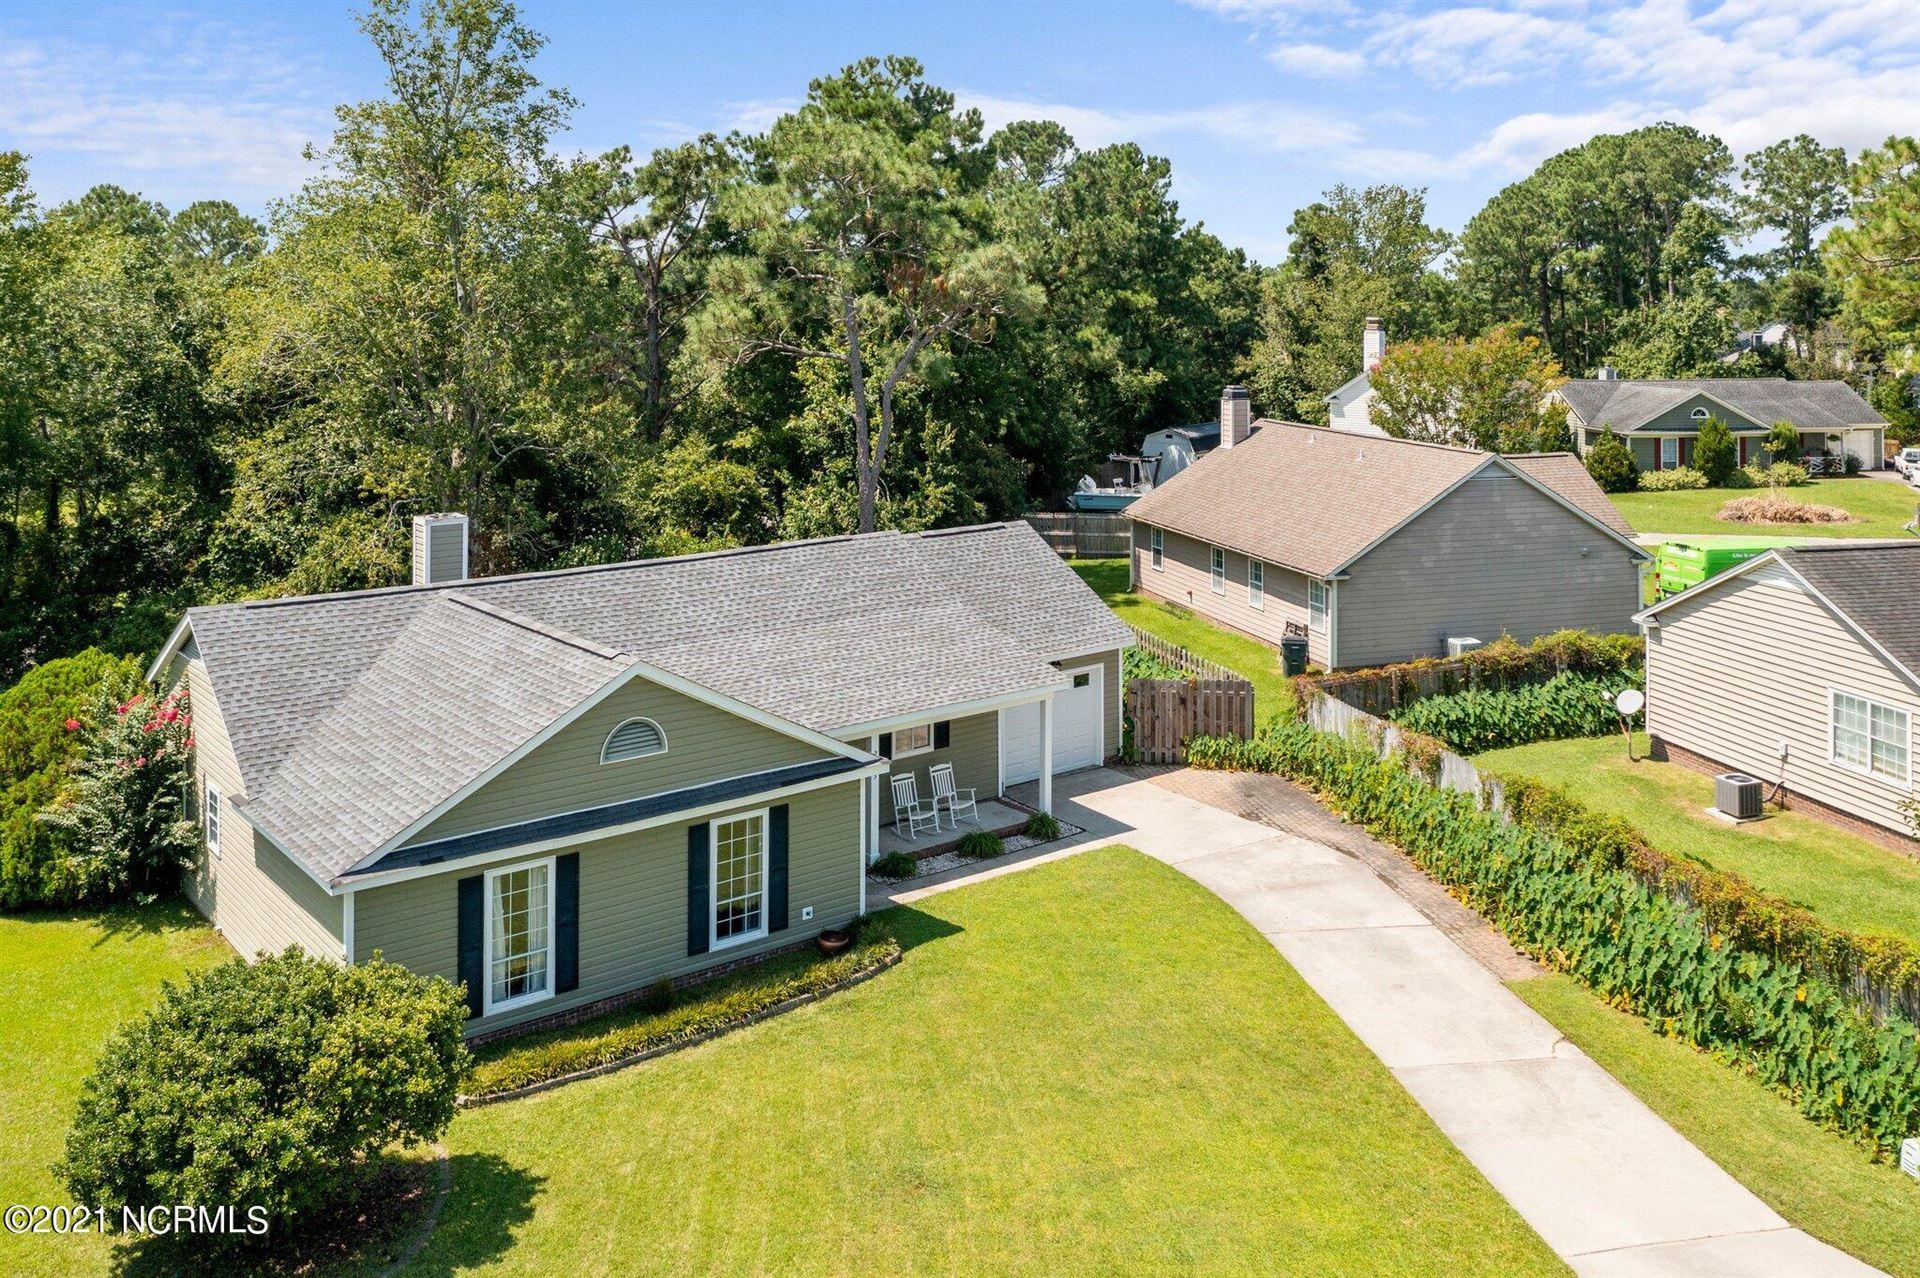 Photo of 2803 Carthage Drive, Wilmington, NC 28405 (MLS # 100287972)